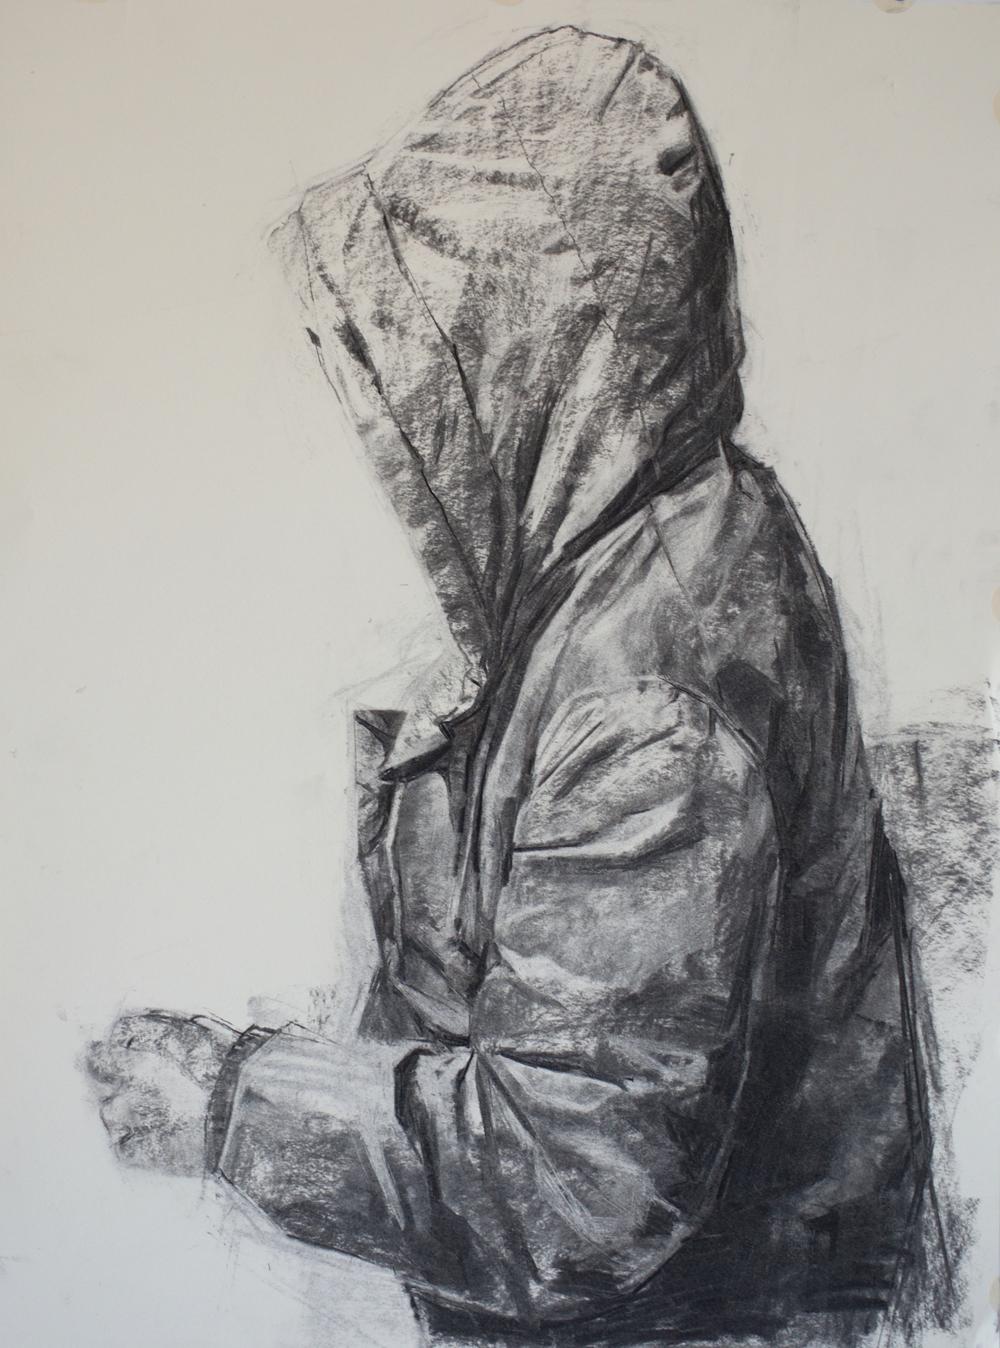 Hoodie Study, charcoal, 18x24 inch, 2016